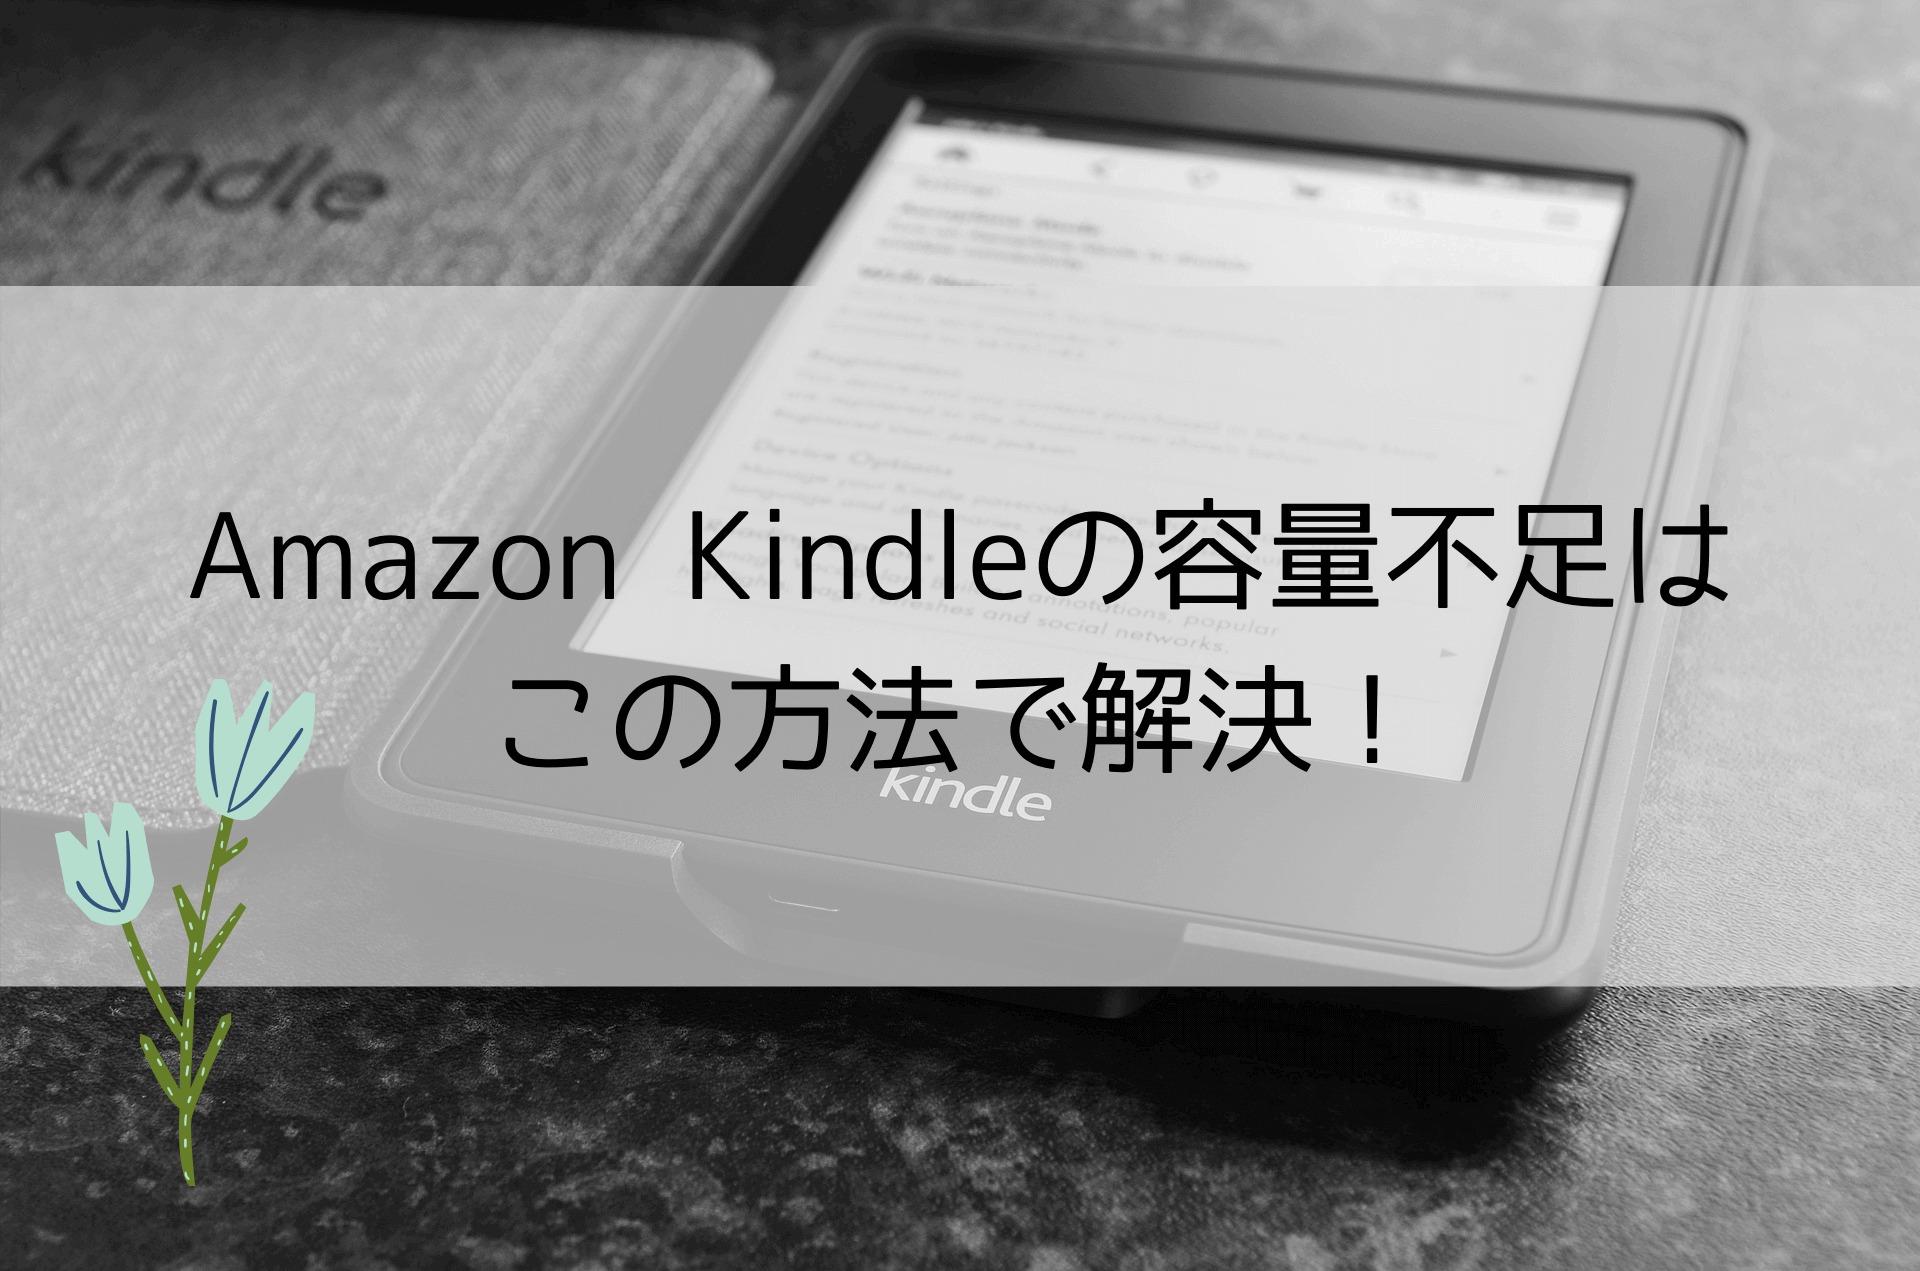 Amazon Kindleの容量不足は この方法で解決!